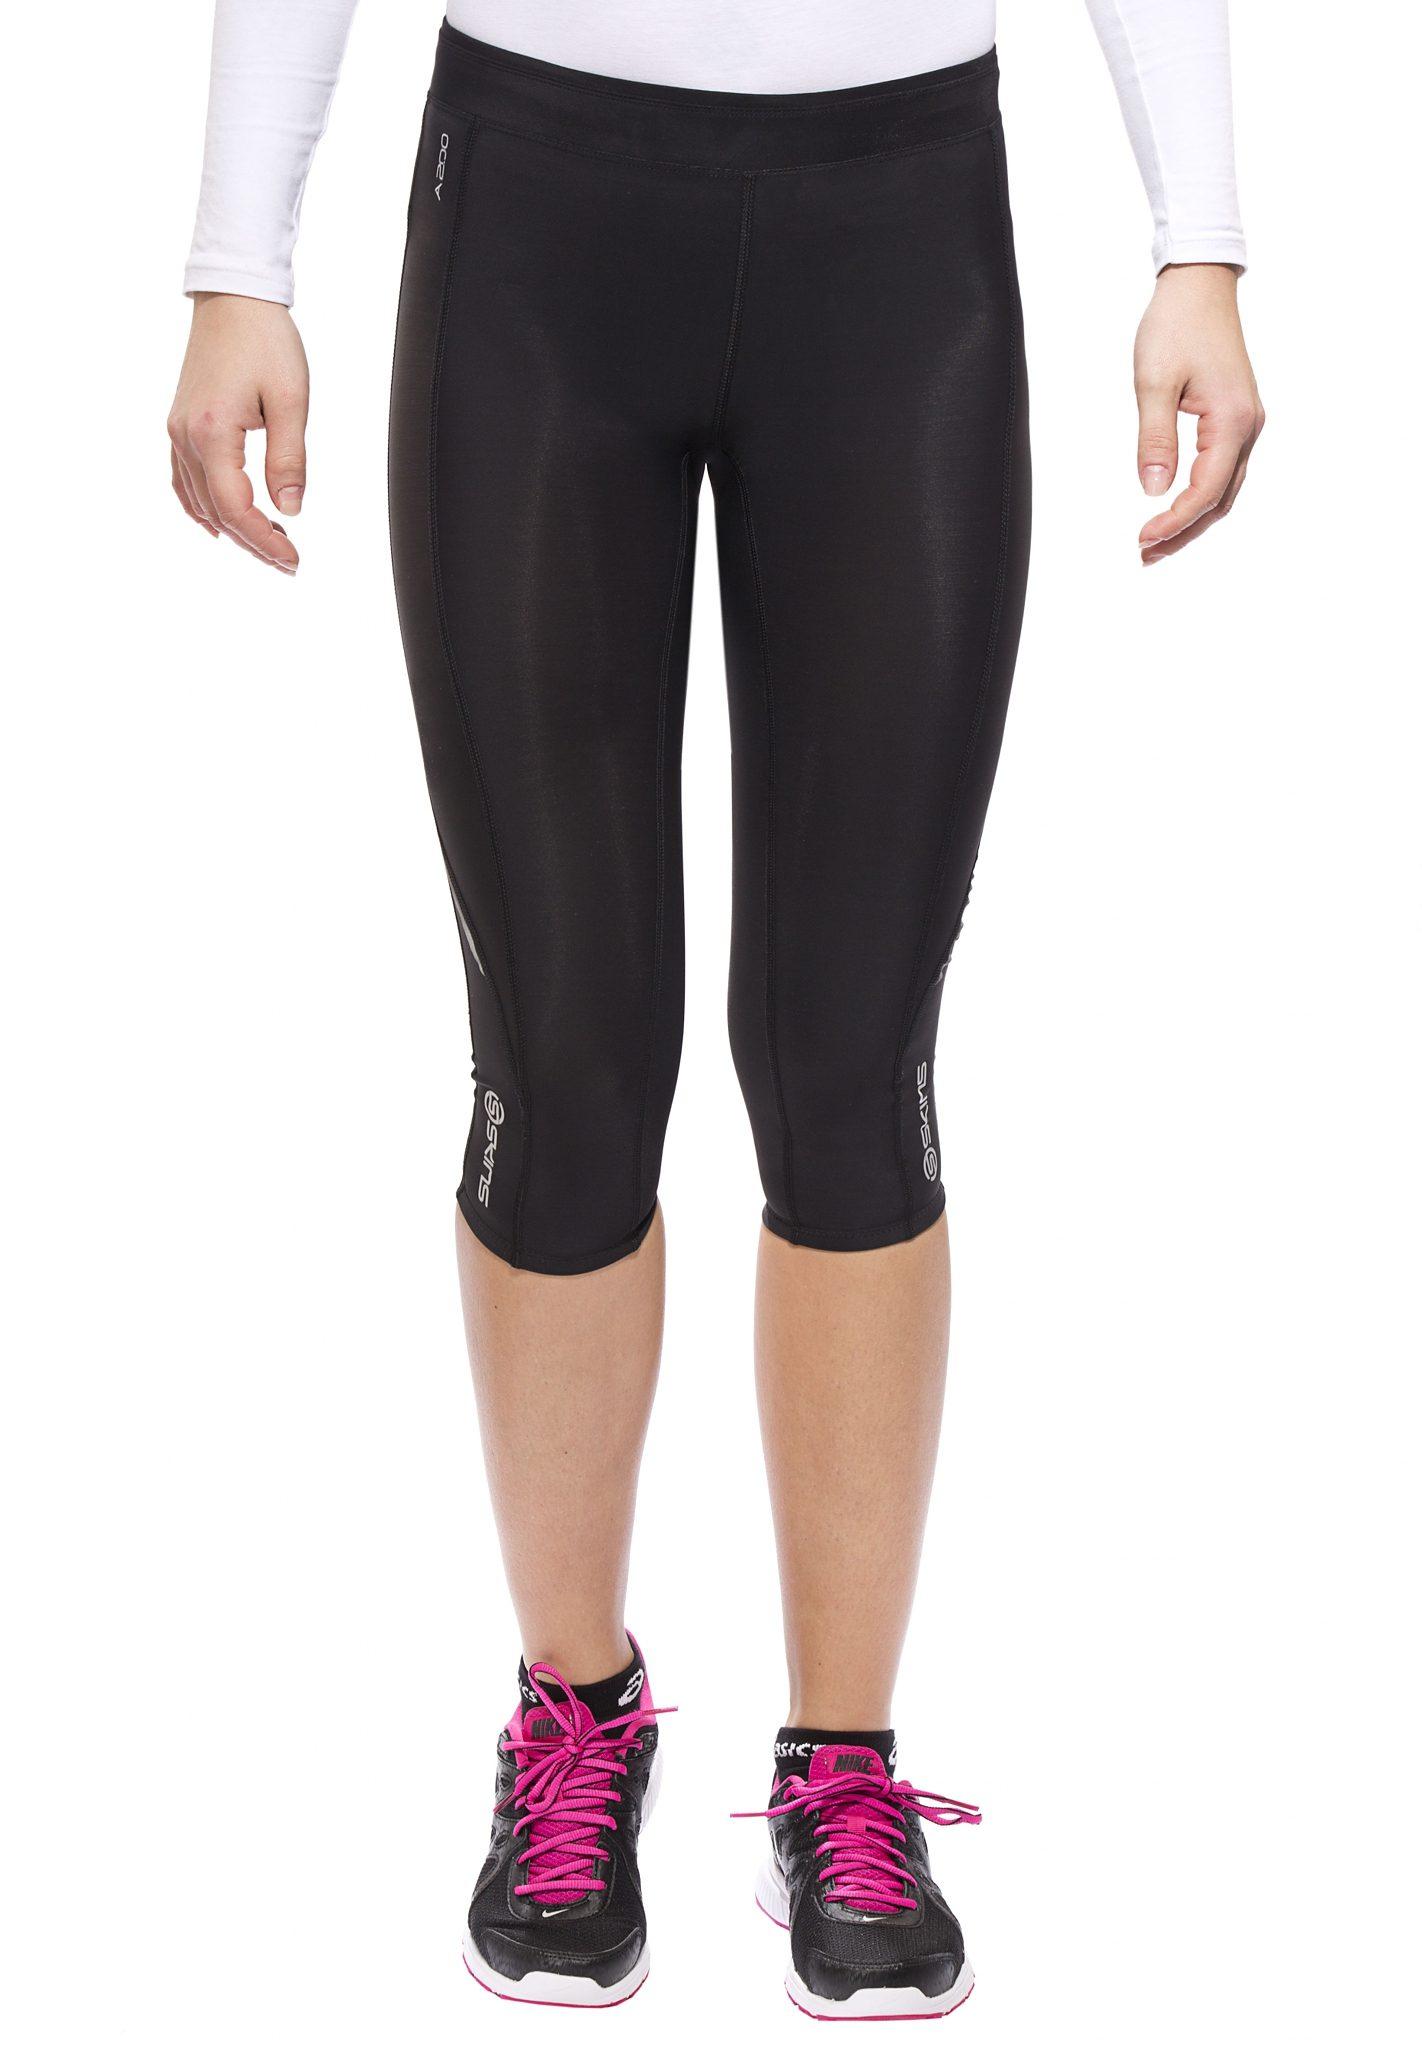 Skins Jogginghose »A200 Capri Tights Women«